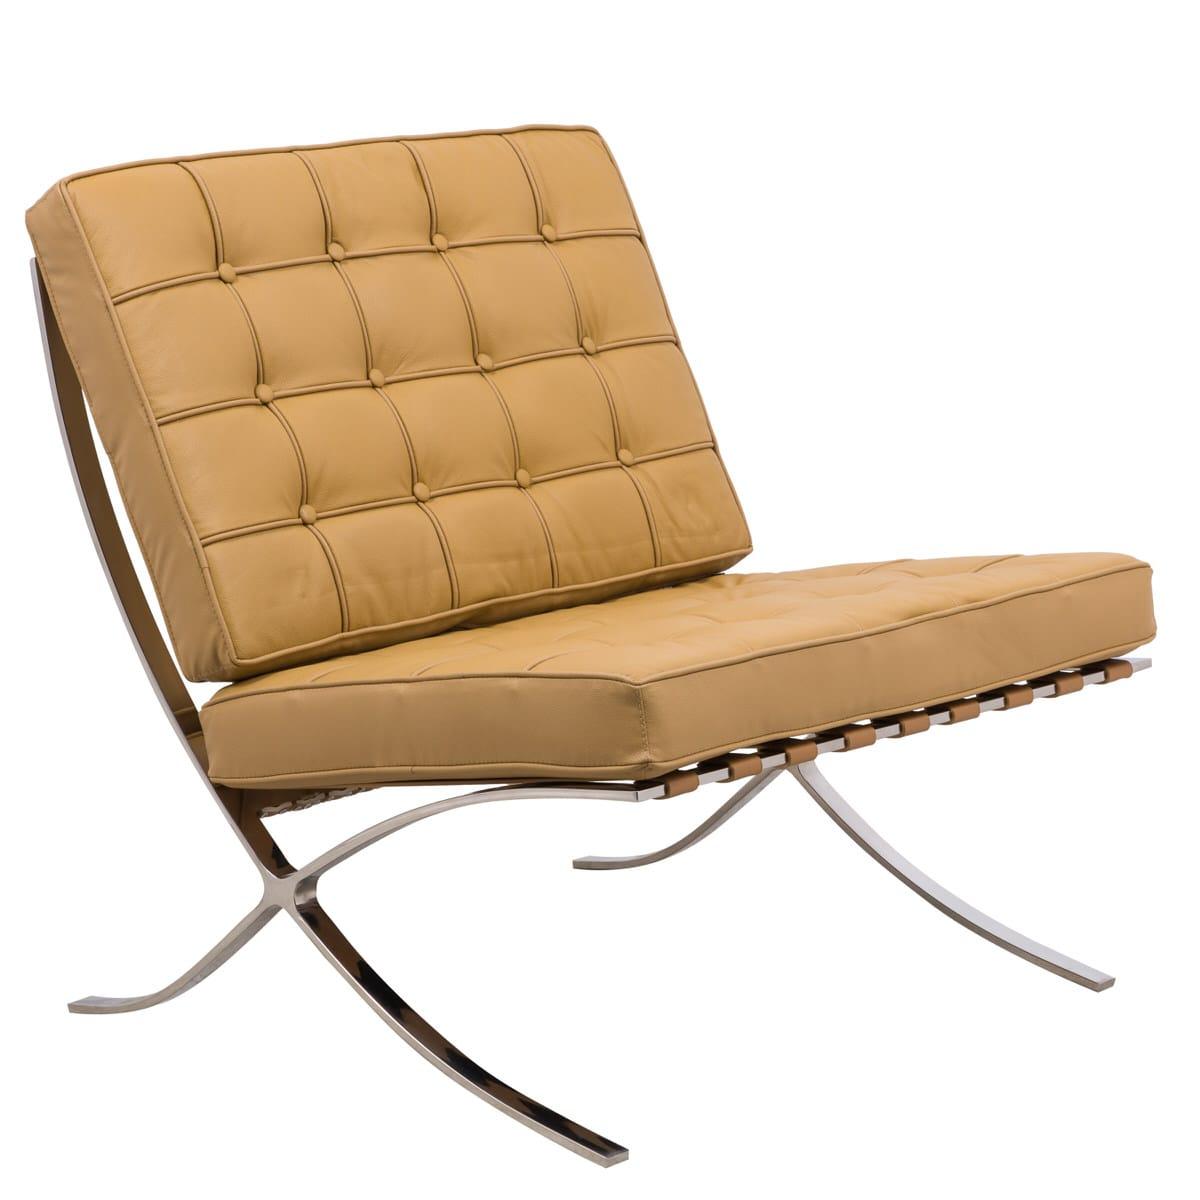 Surprising Bellefonte Style Modern Pavilion Light Brown Leather Chair By Leisuremod Machost Co Dining Chair Design Ideas Machostcouk